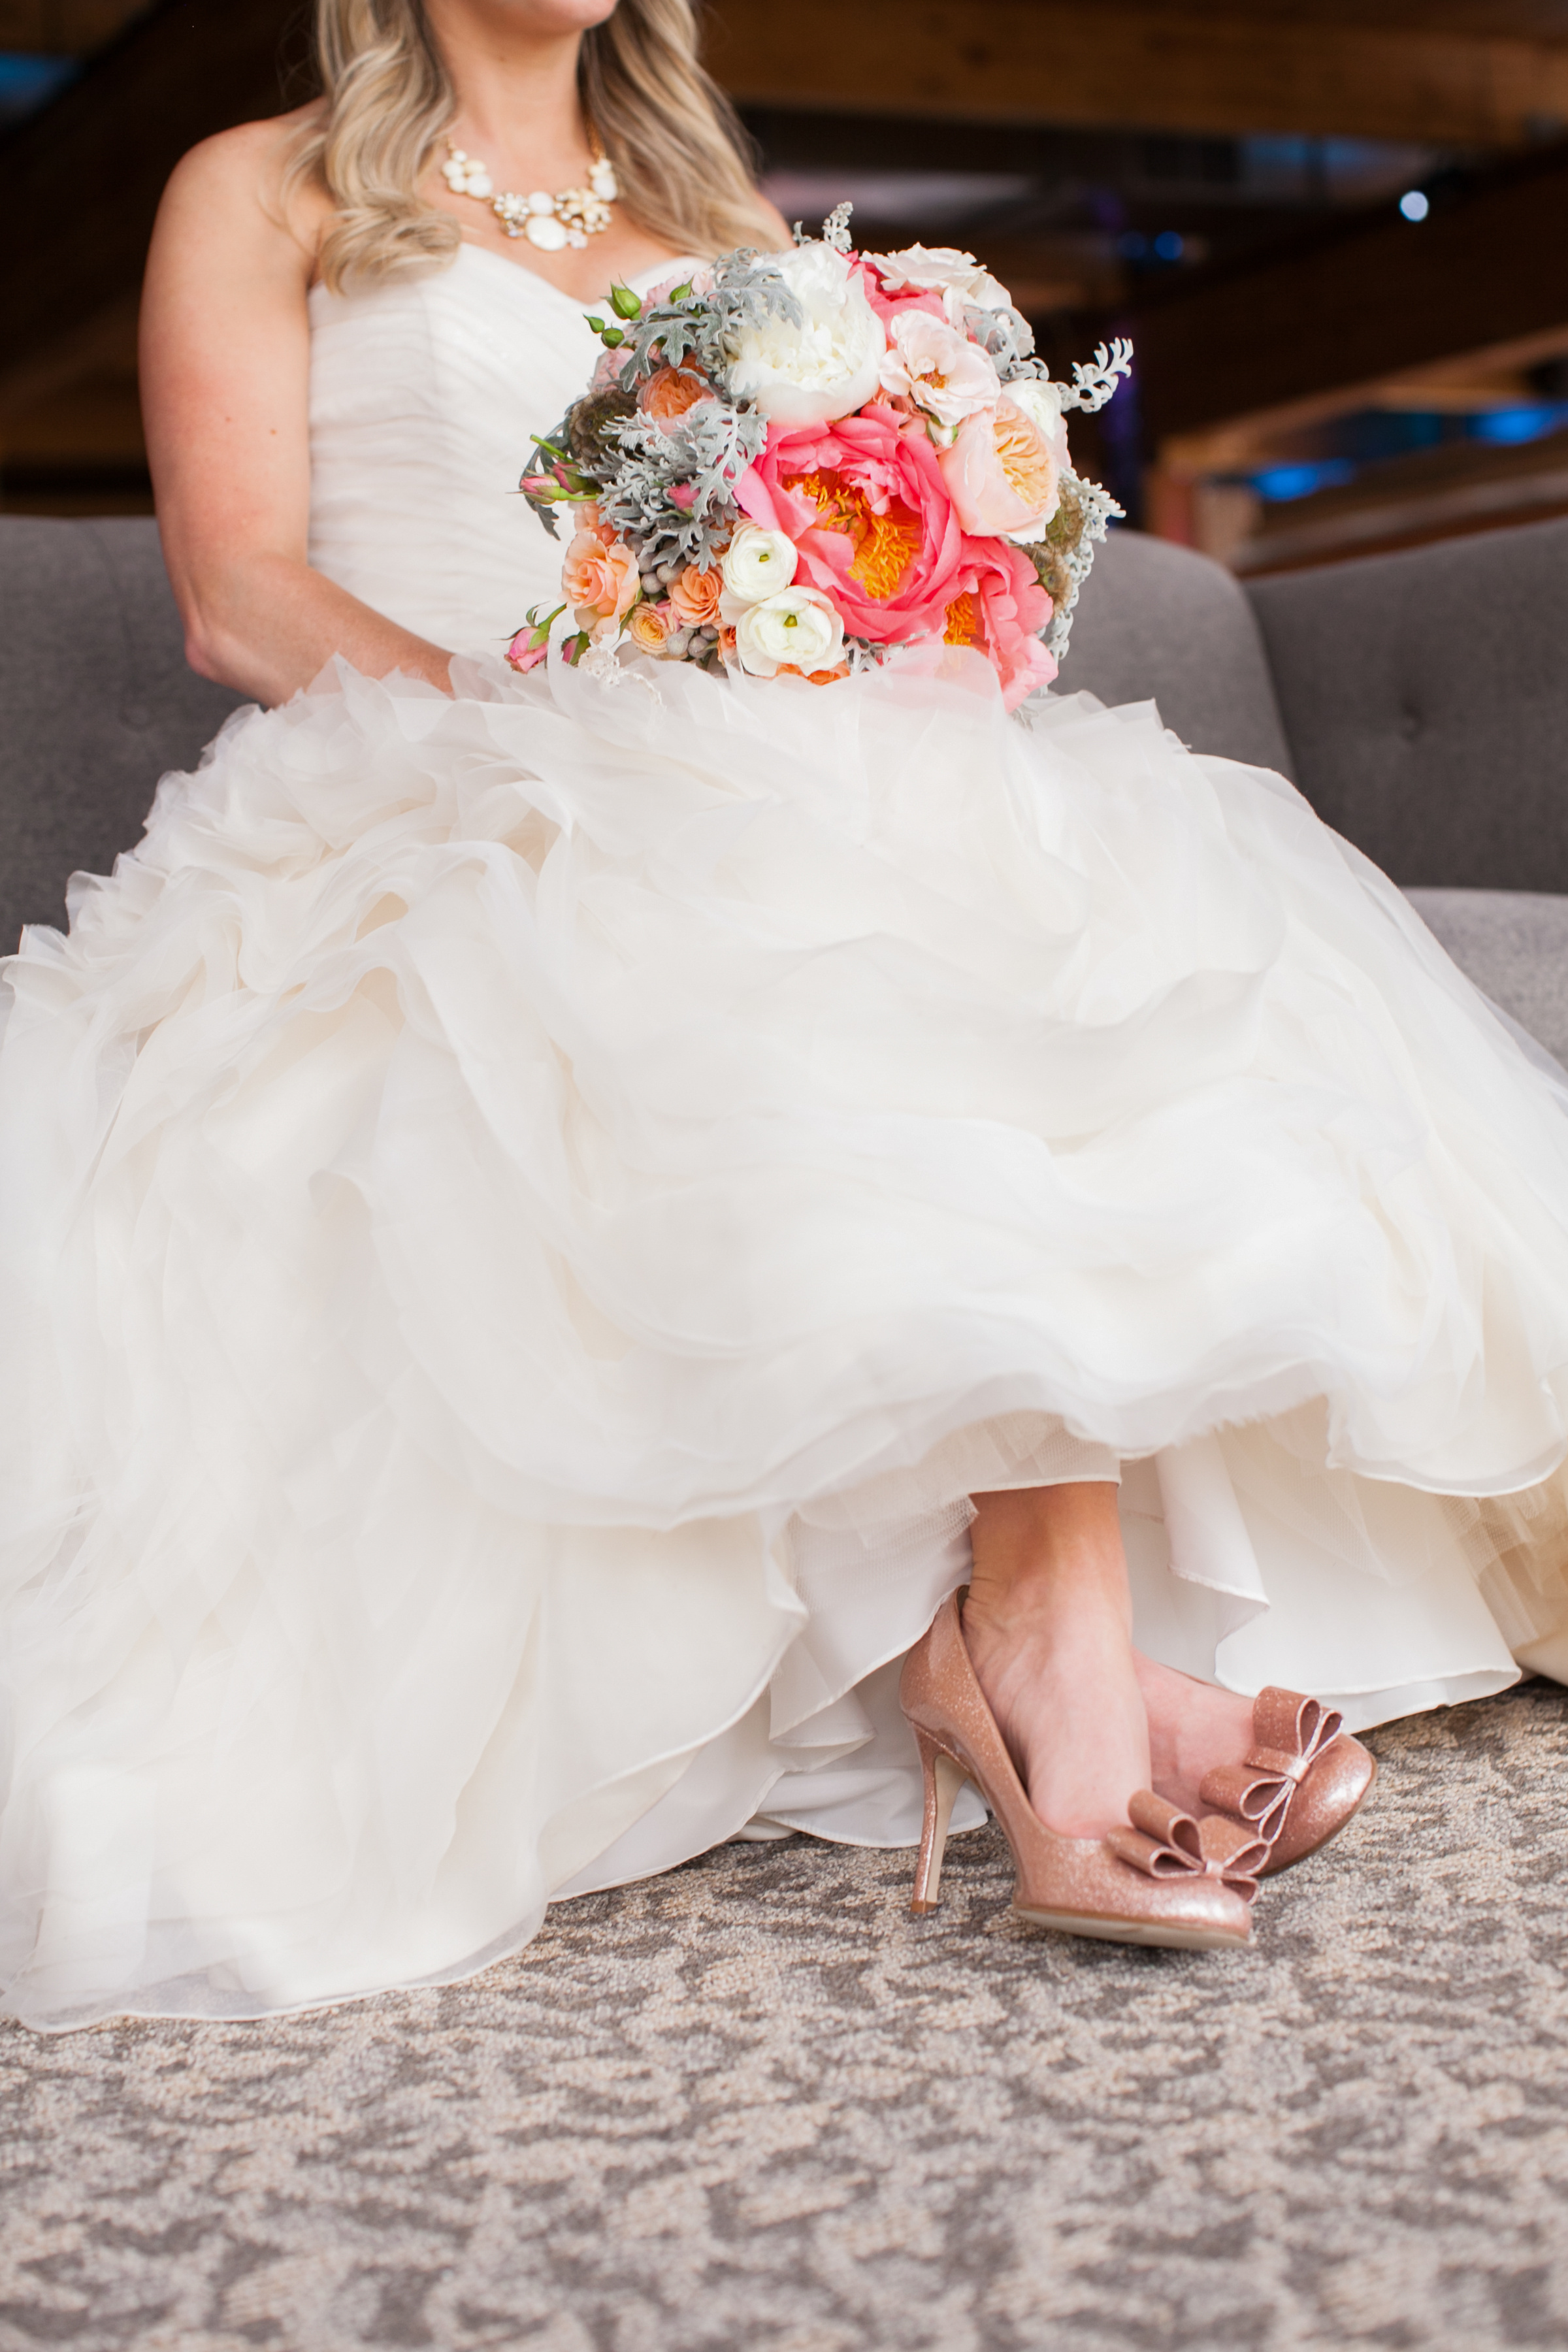 Erin & Mike  Featured on Minnesota Bride